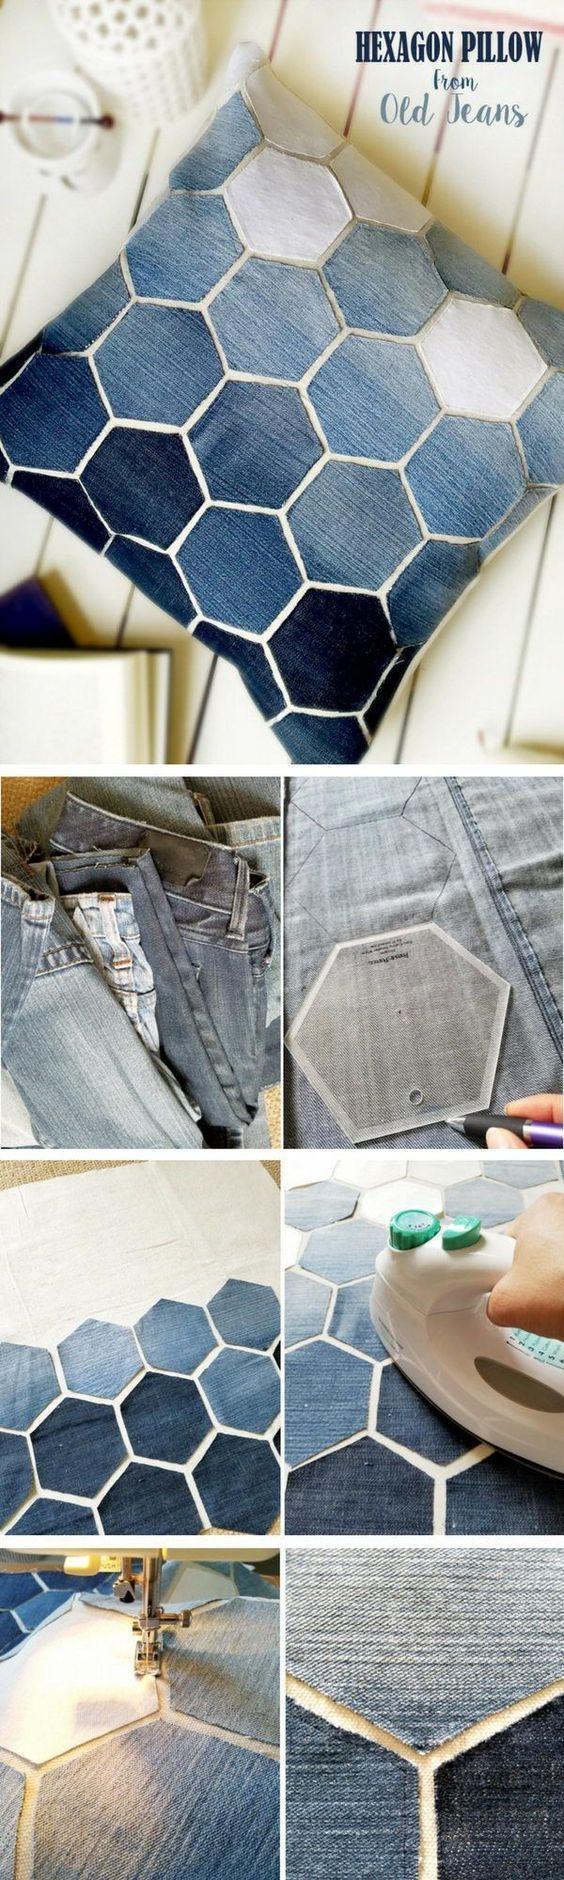 74 TOLLE Ideen, um Jeans zu recyceln | Mein gewünschtes Zuhause